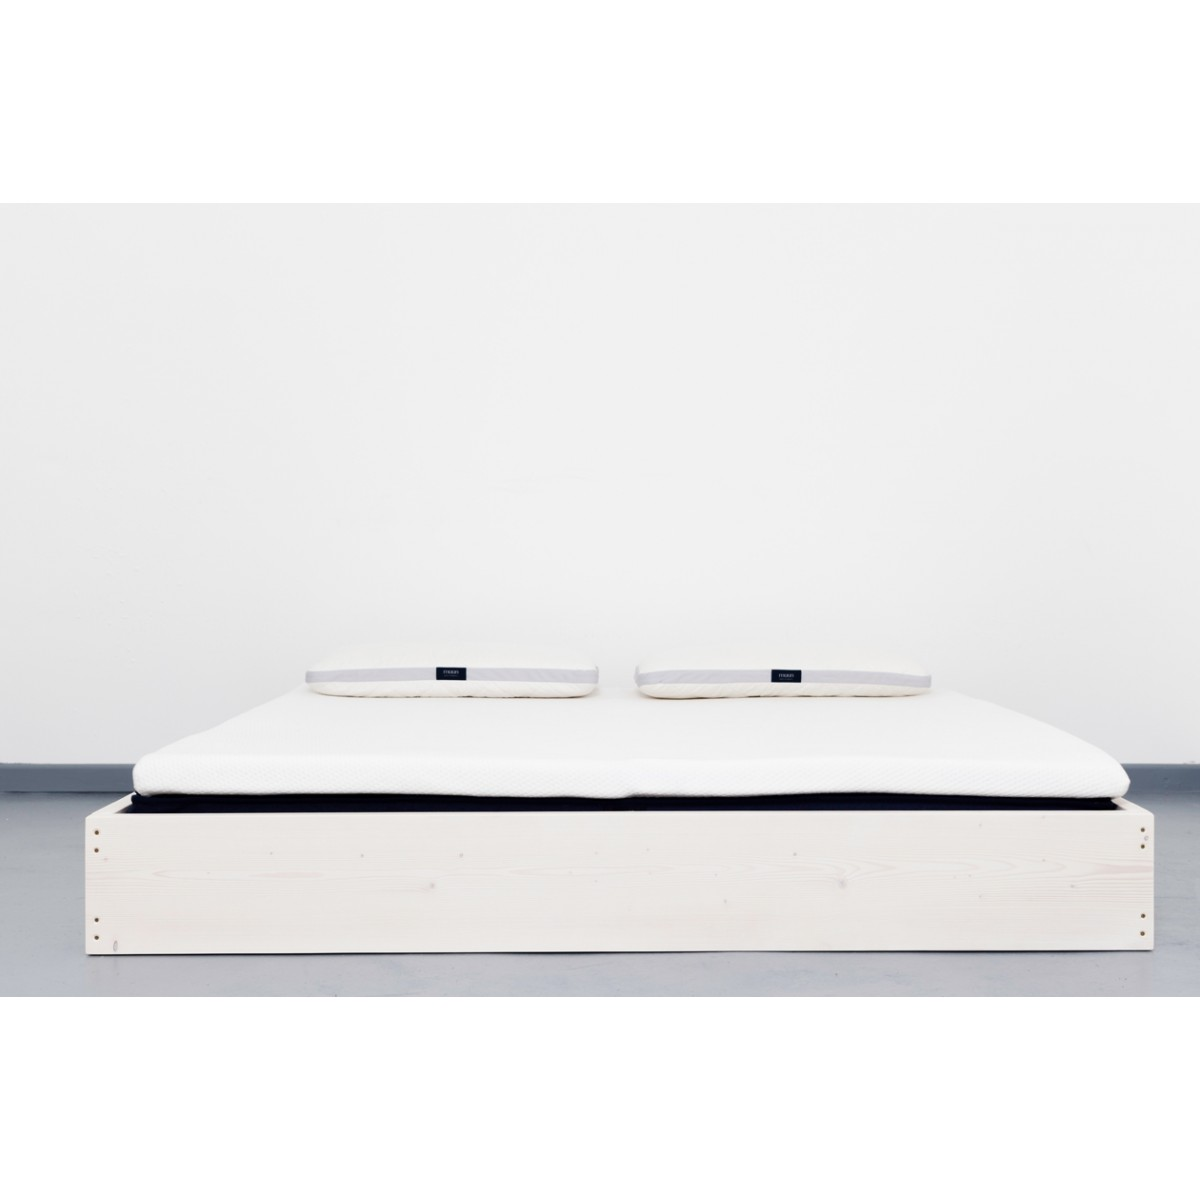 Puristisches Upcycling Bett aus recyceltem Massivholz | SIGONSE